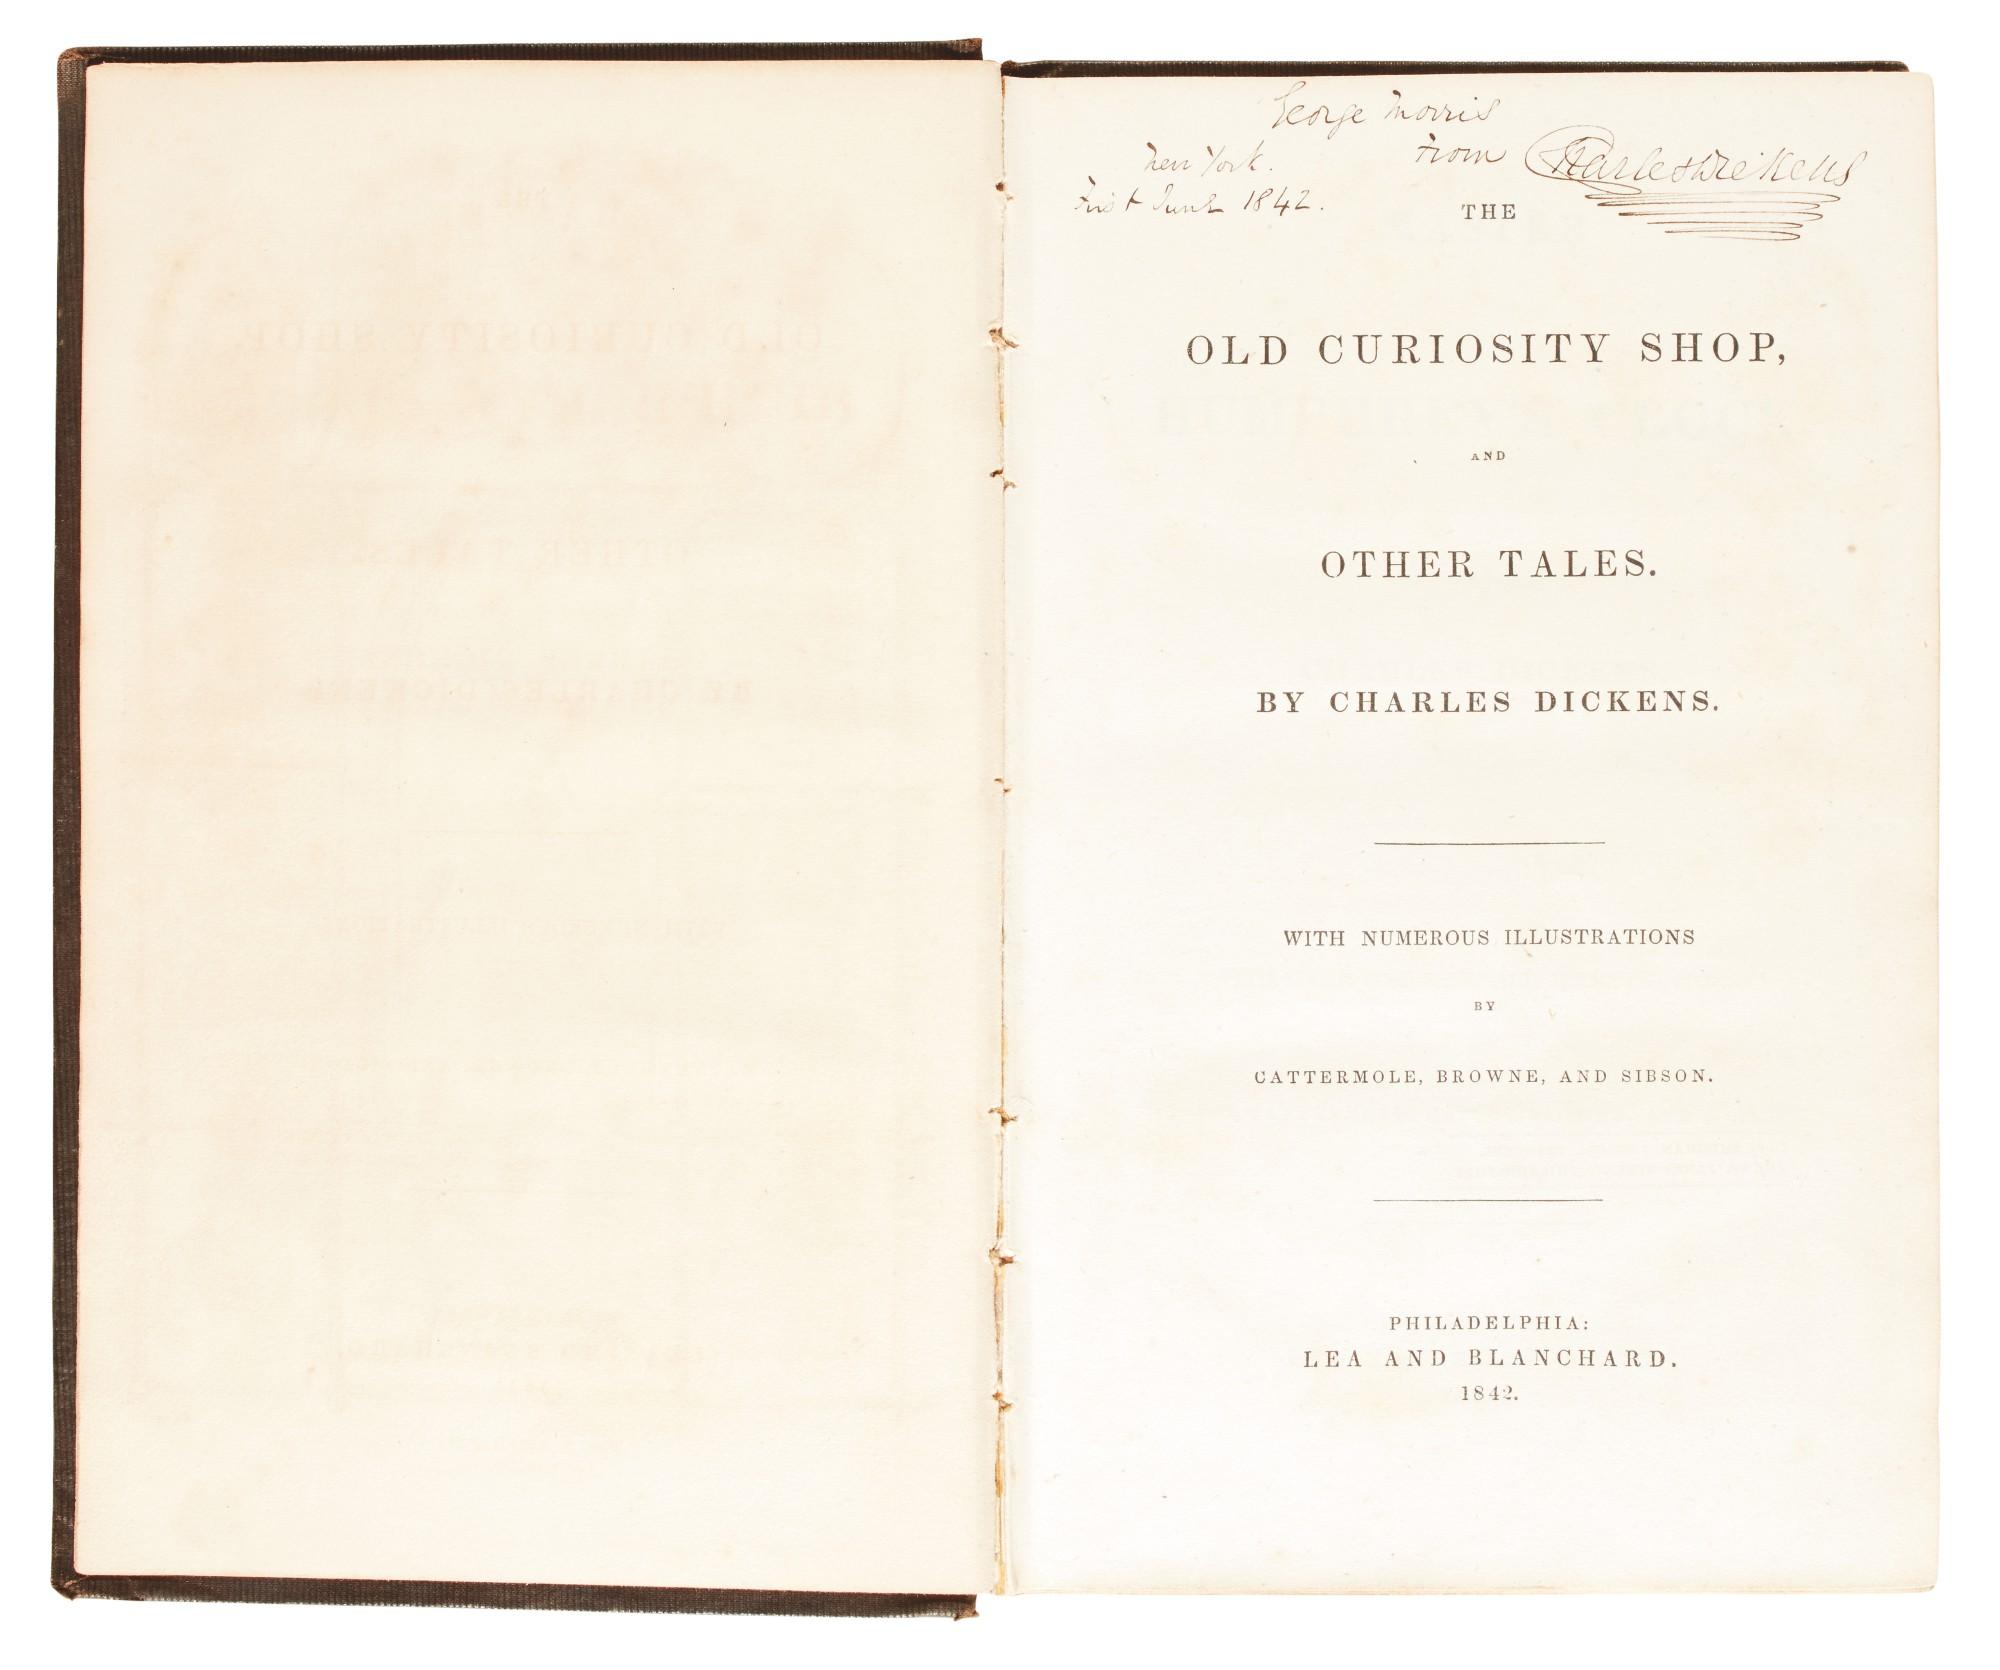 Dickens, Old Curiosity Shop, 1842, second American edition, presentation copy inscribed to Morris